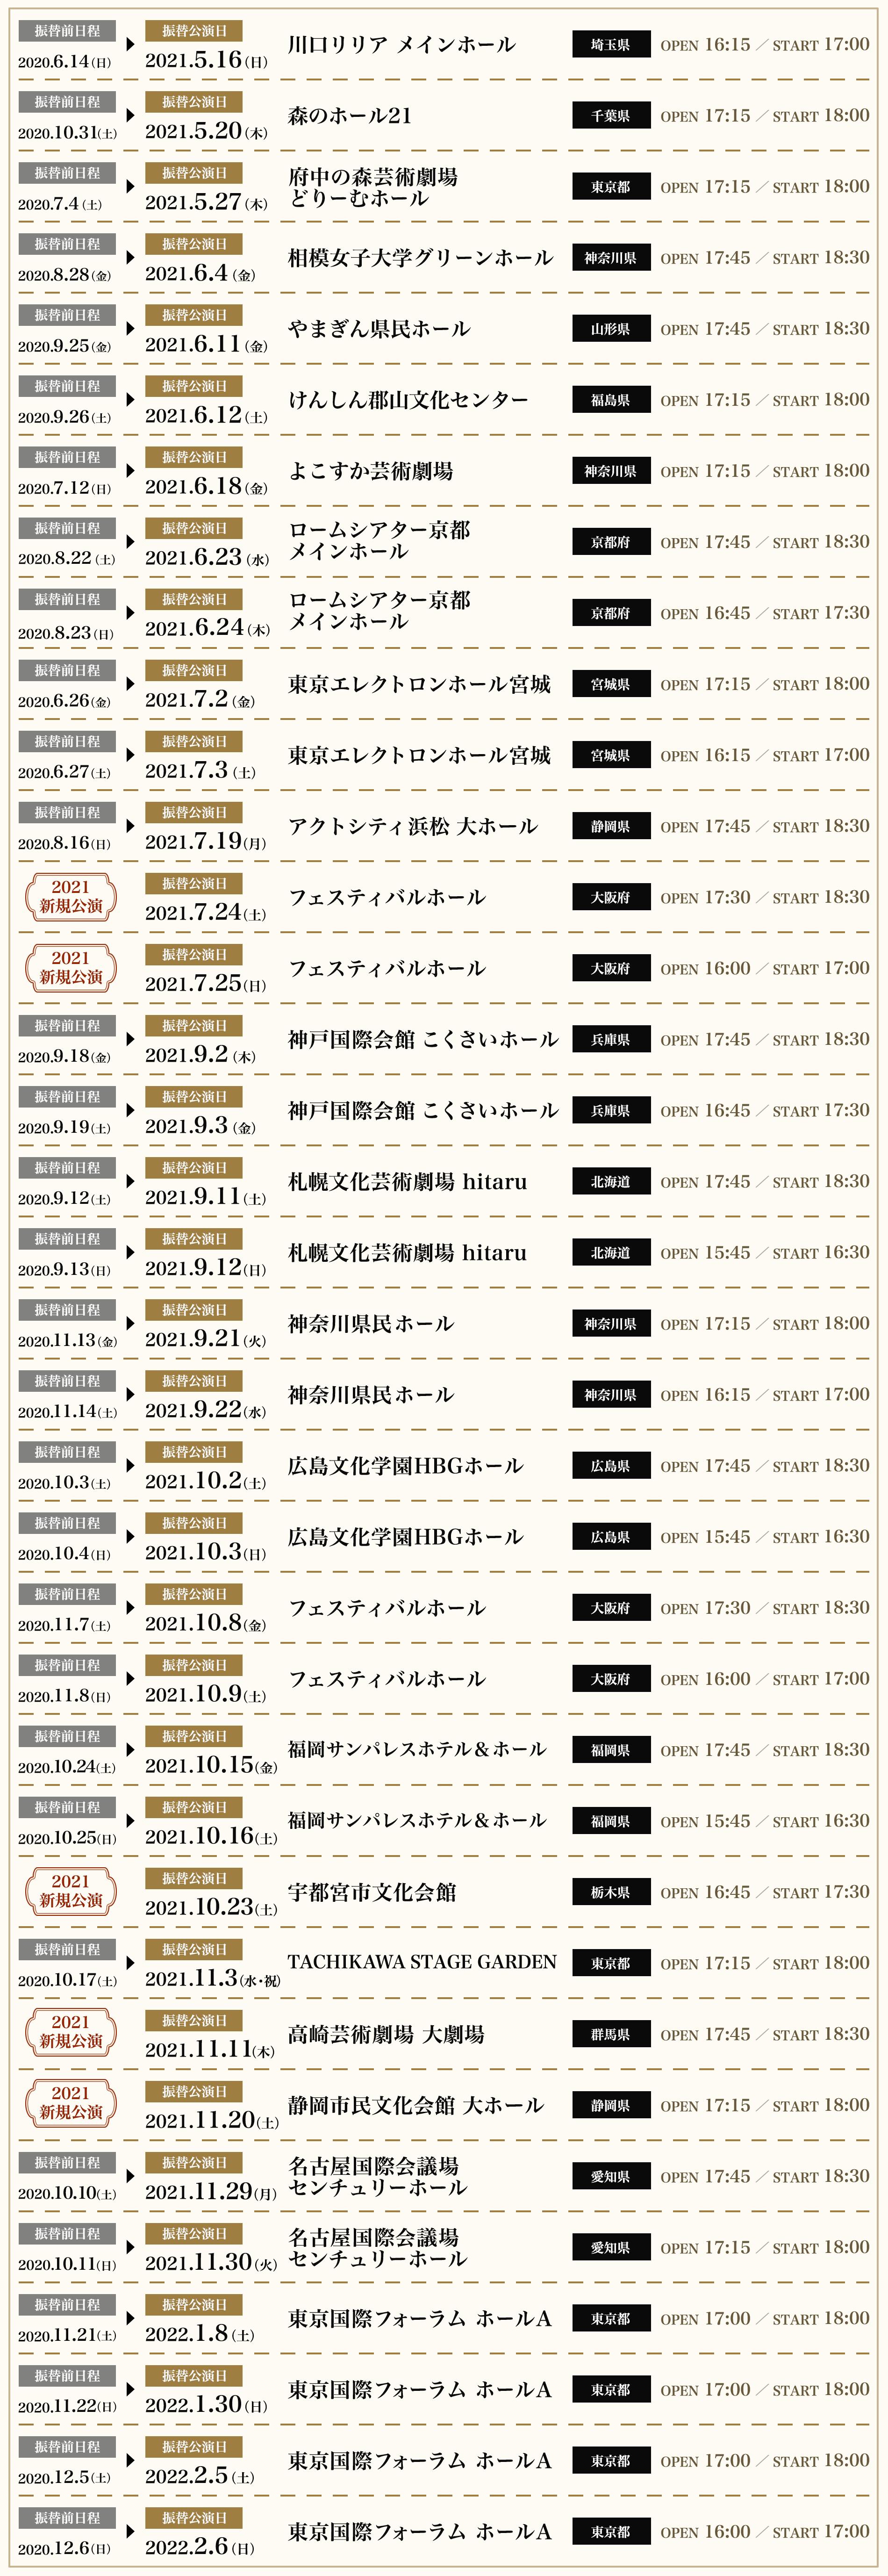 ツアー全日程表